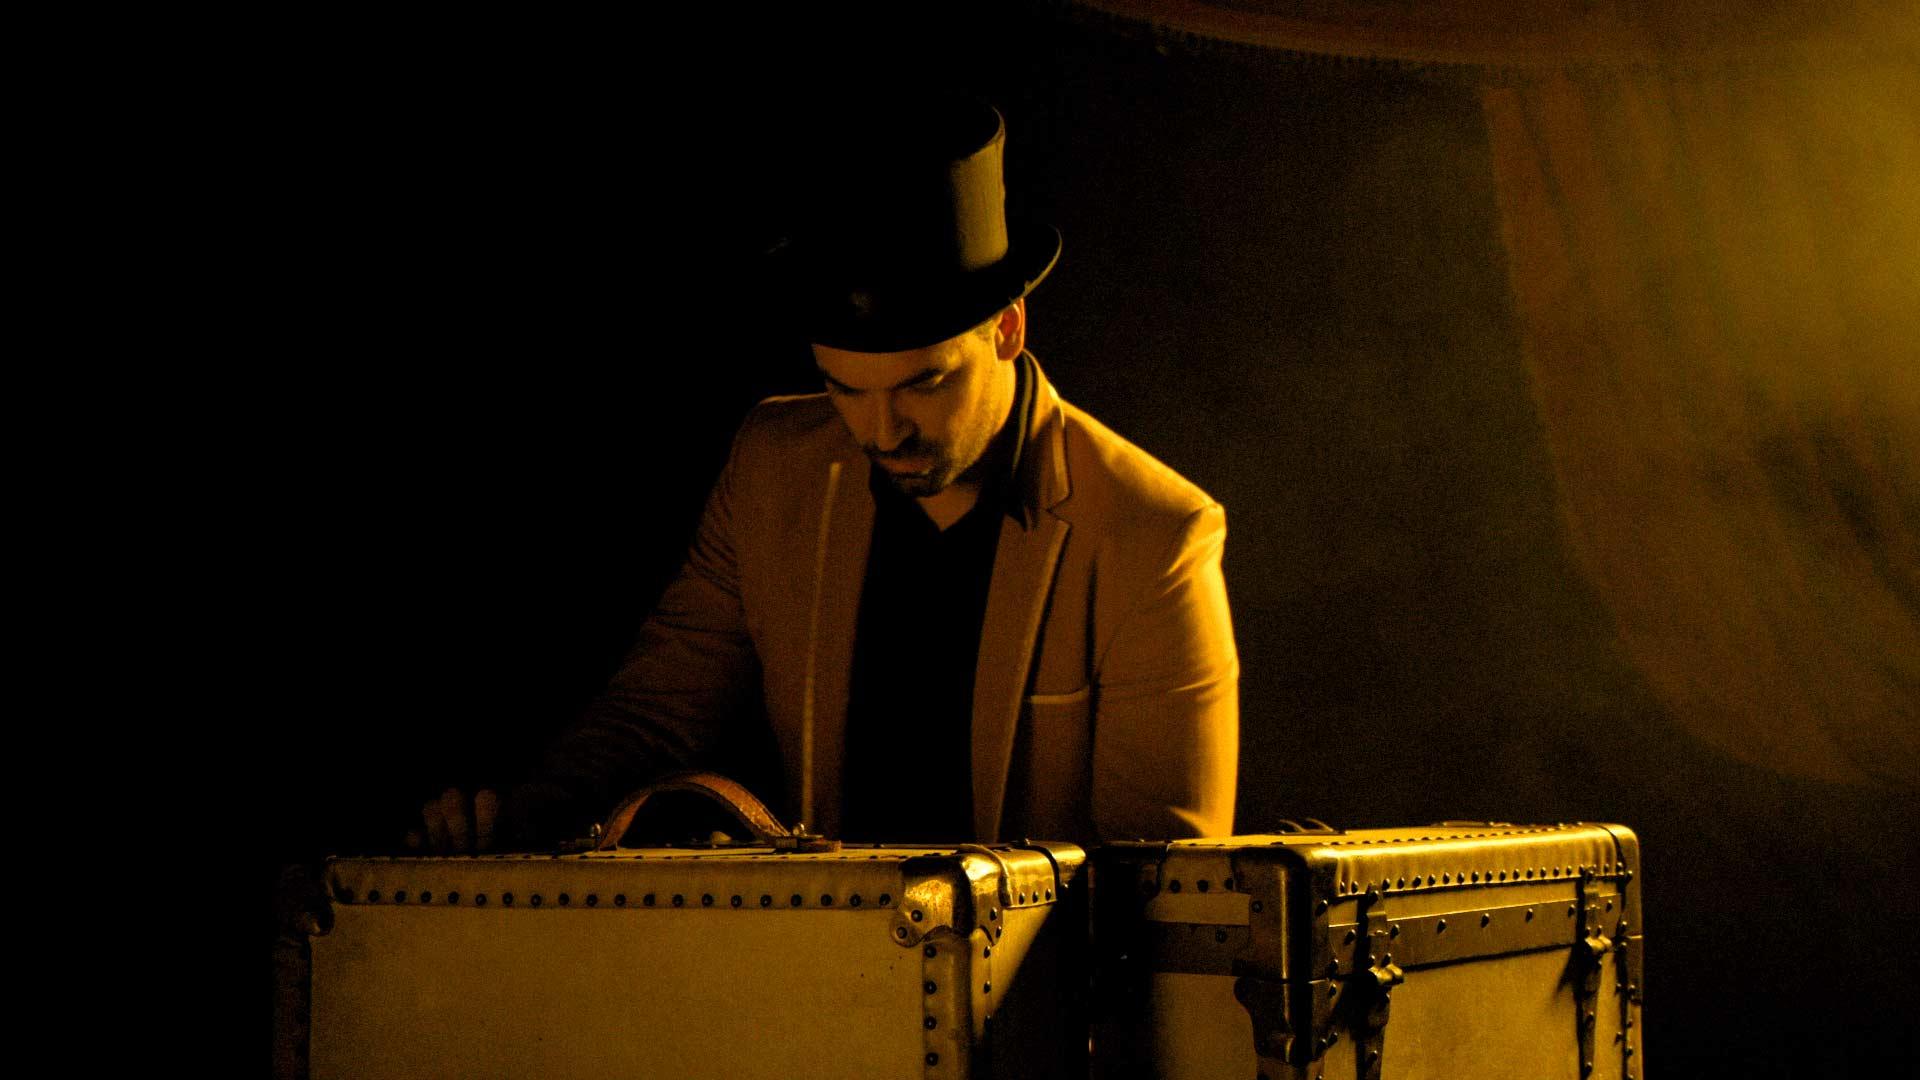 magicien professionnel spectacle noel